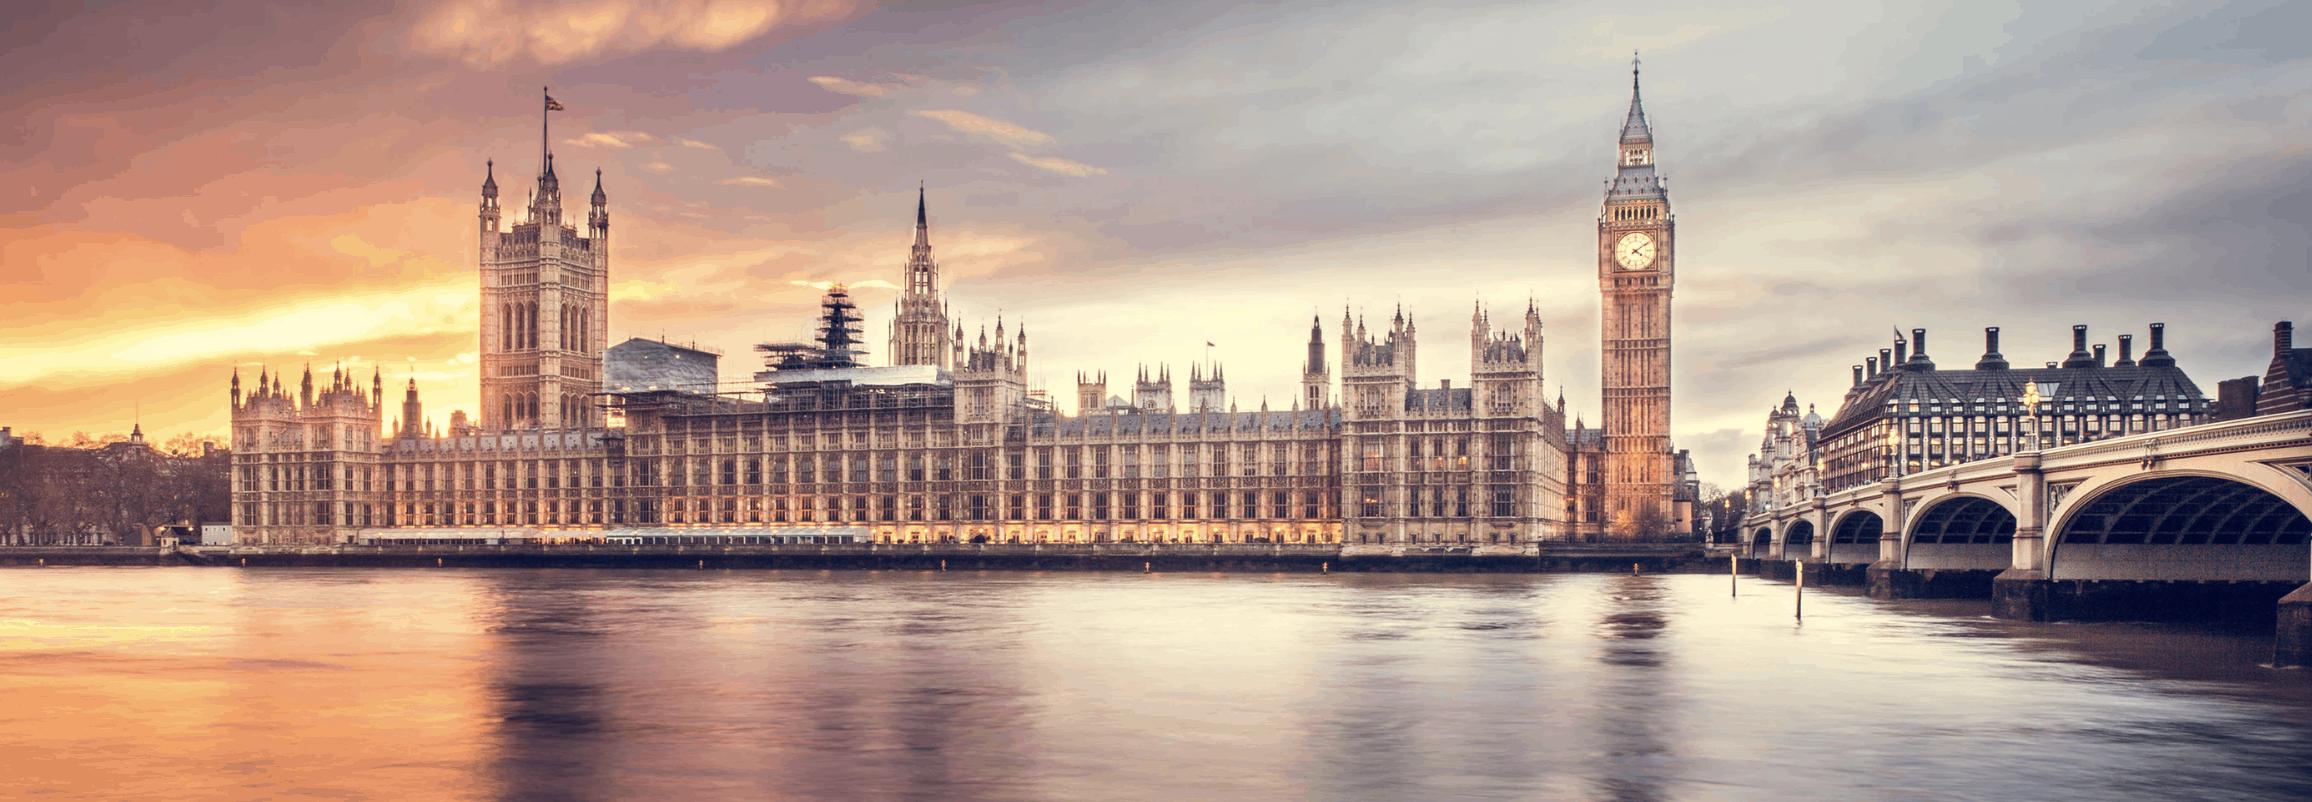 list of uk real estate investors